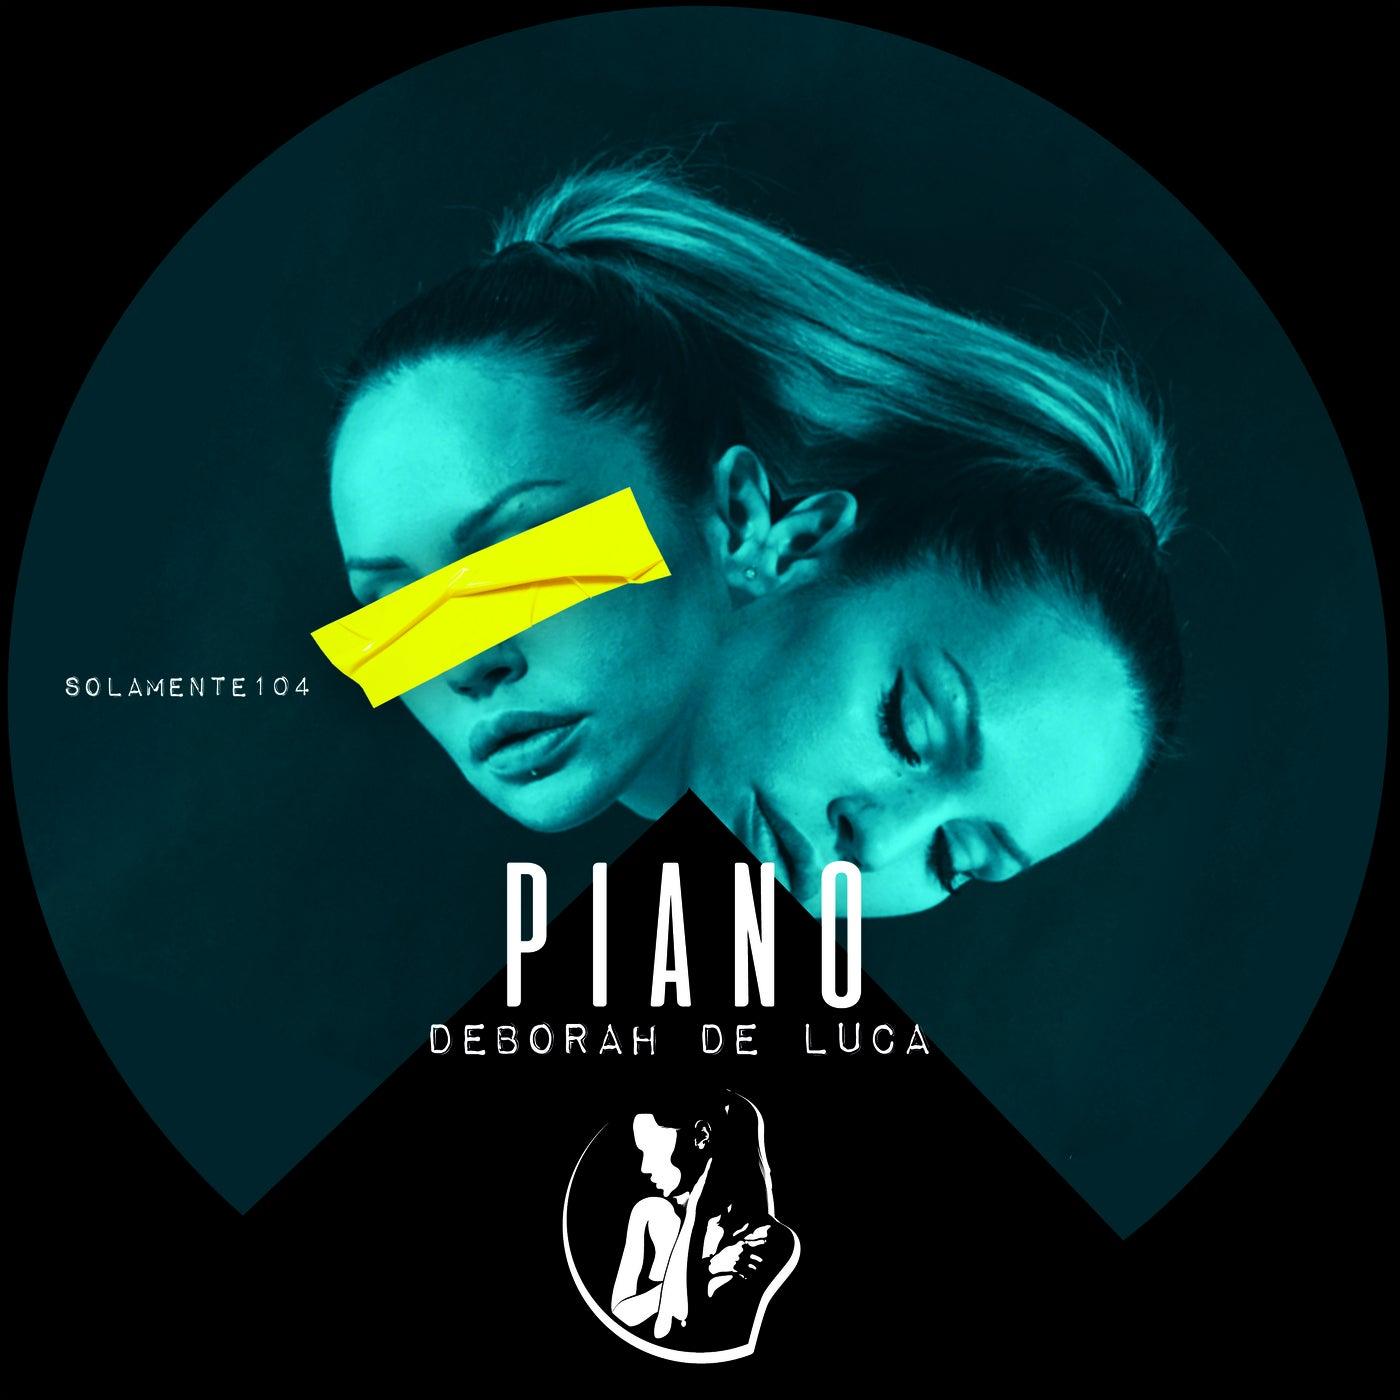 Piano (Original Mix)